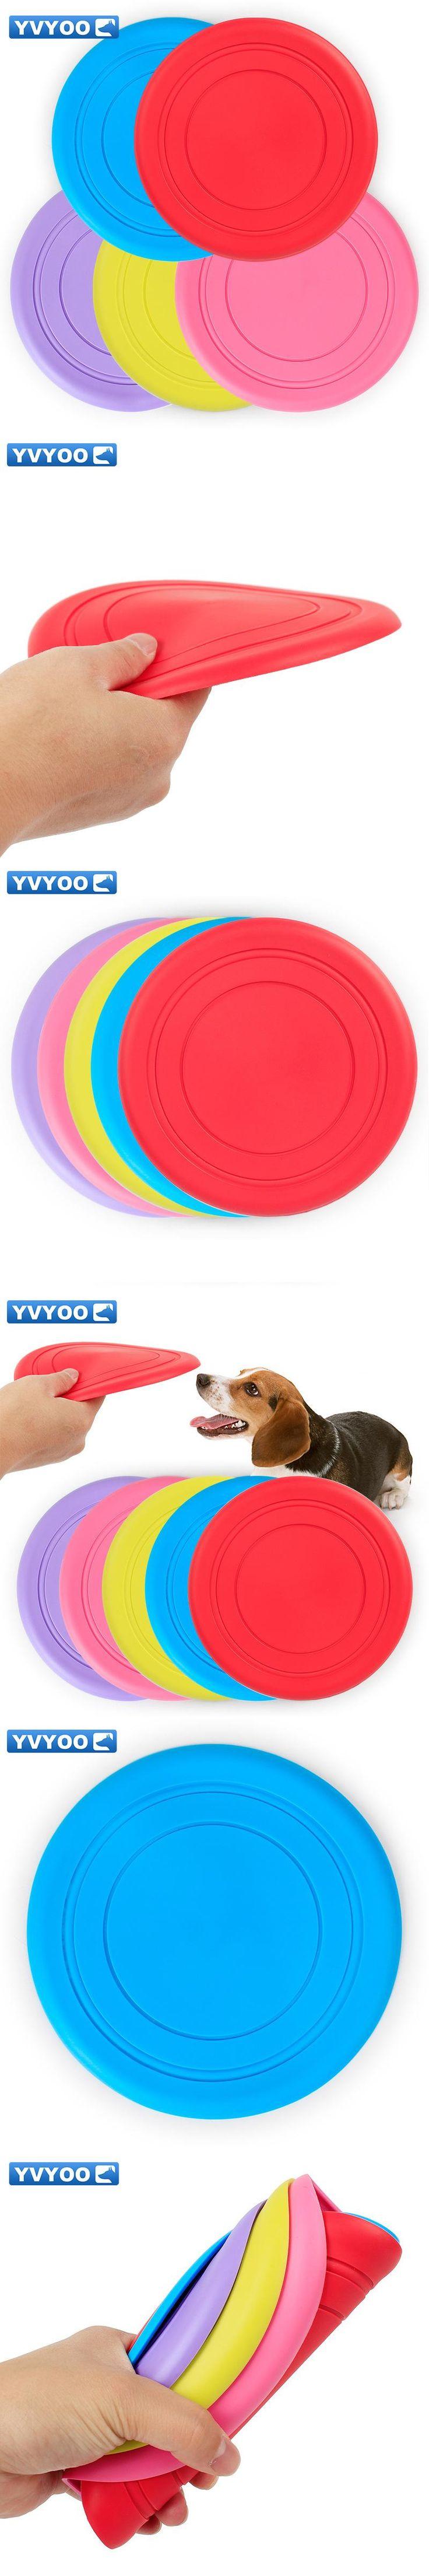 Best 25 Flying disc ideas on Pinterest